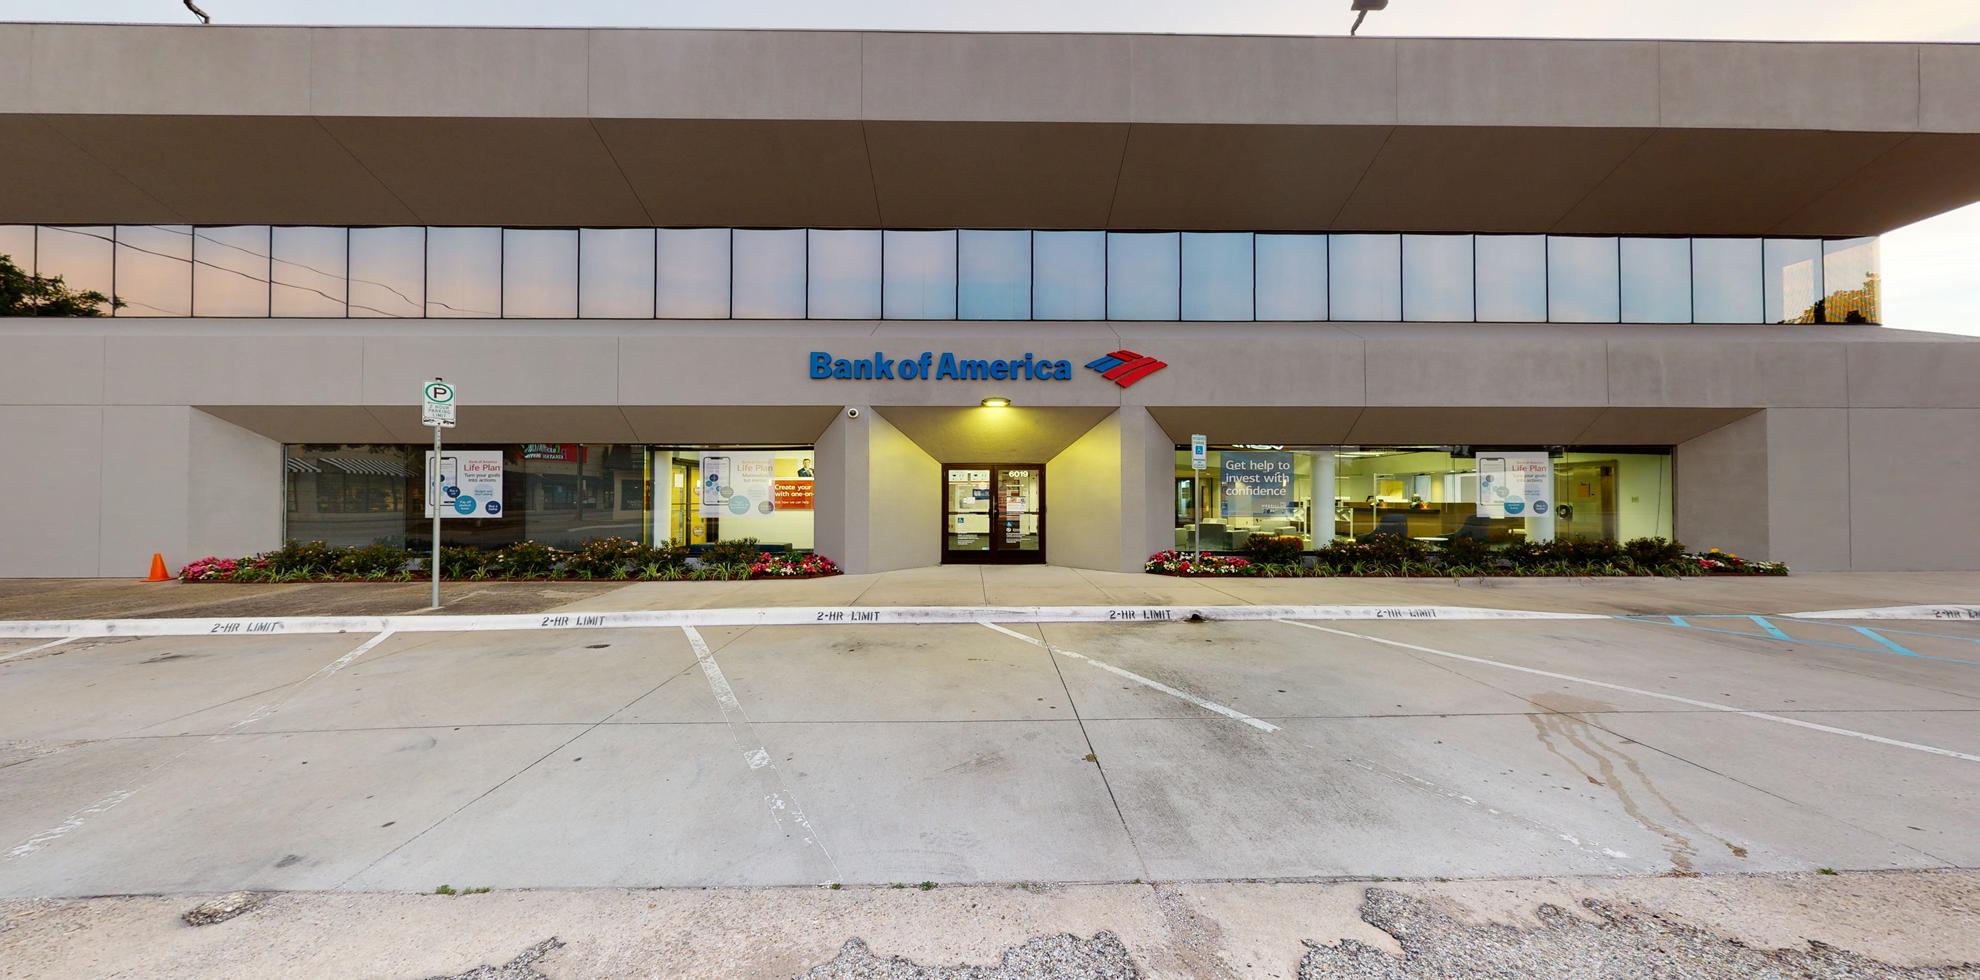 Bank of America financial center with drive-thru ATM   6019 Berkshire Ln, Dallas, TX 75225